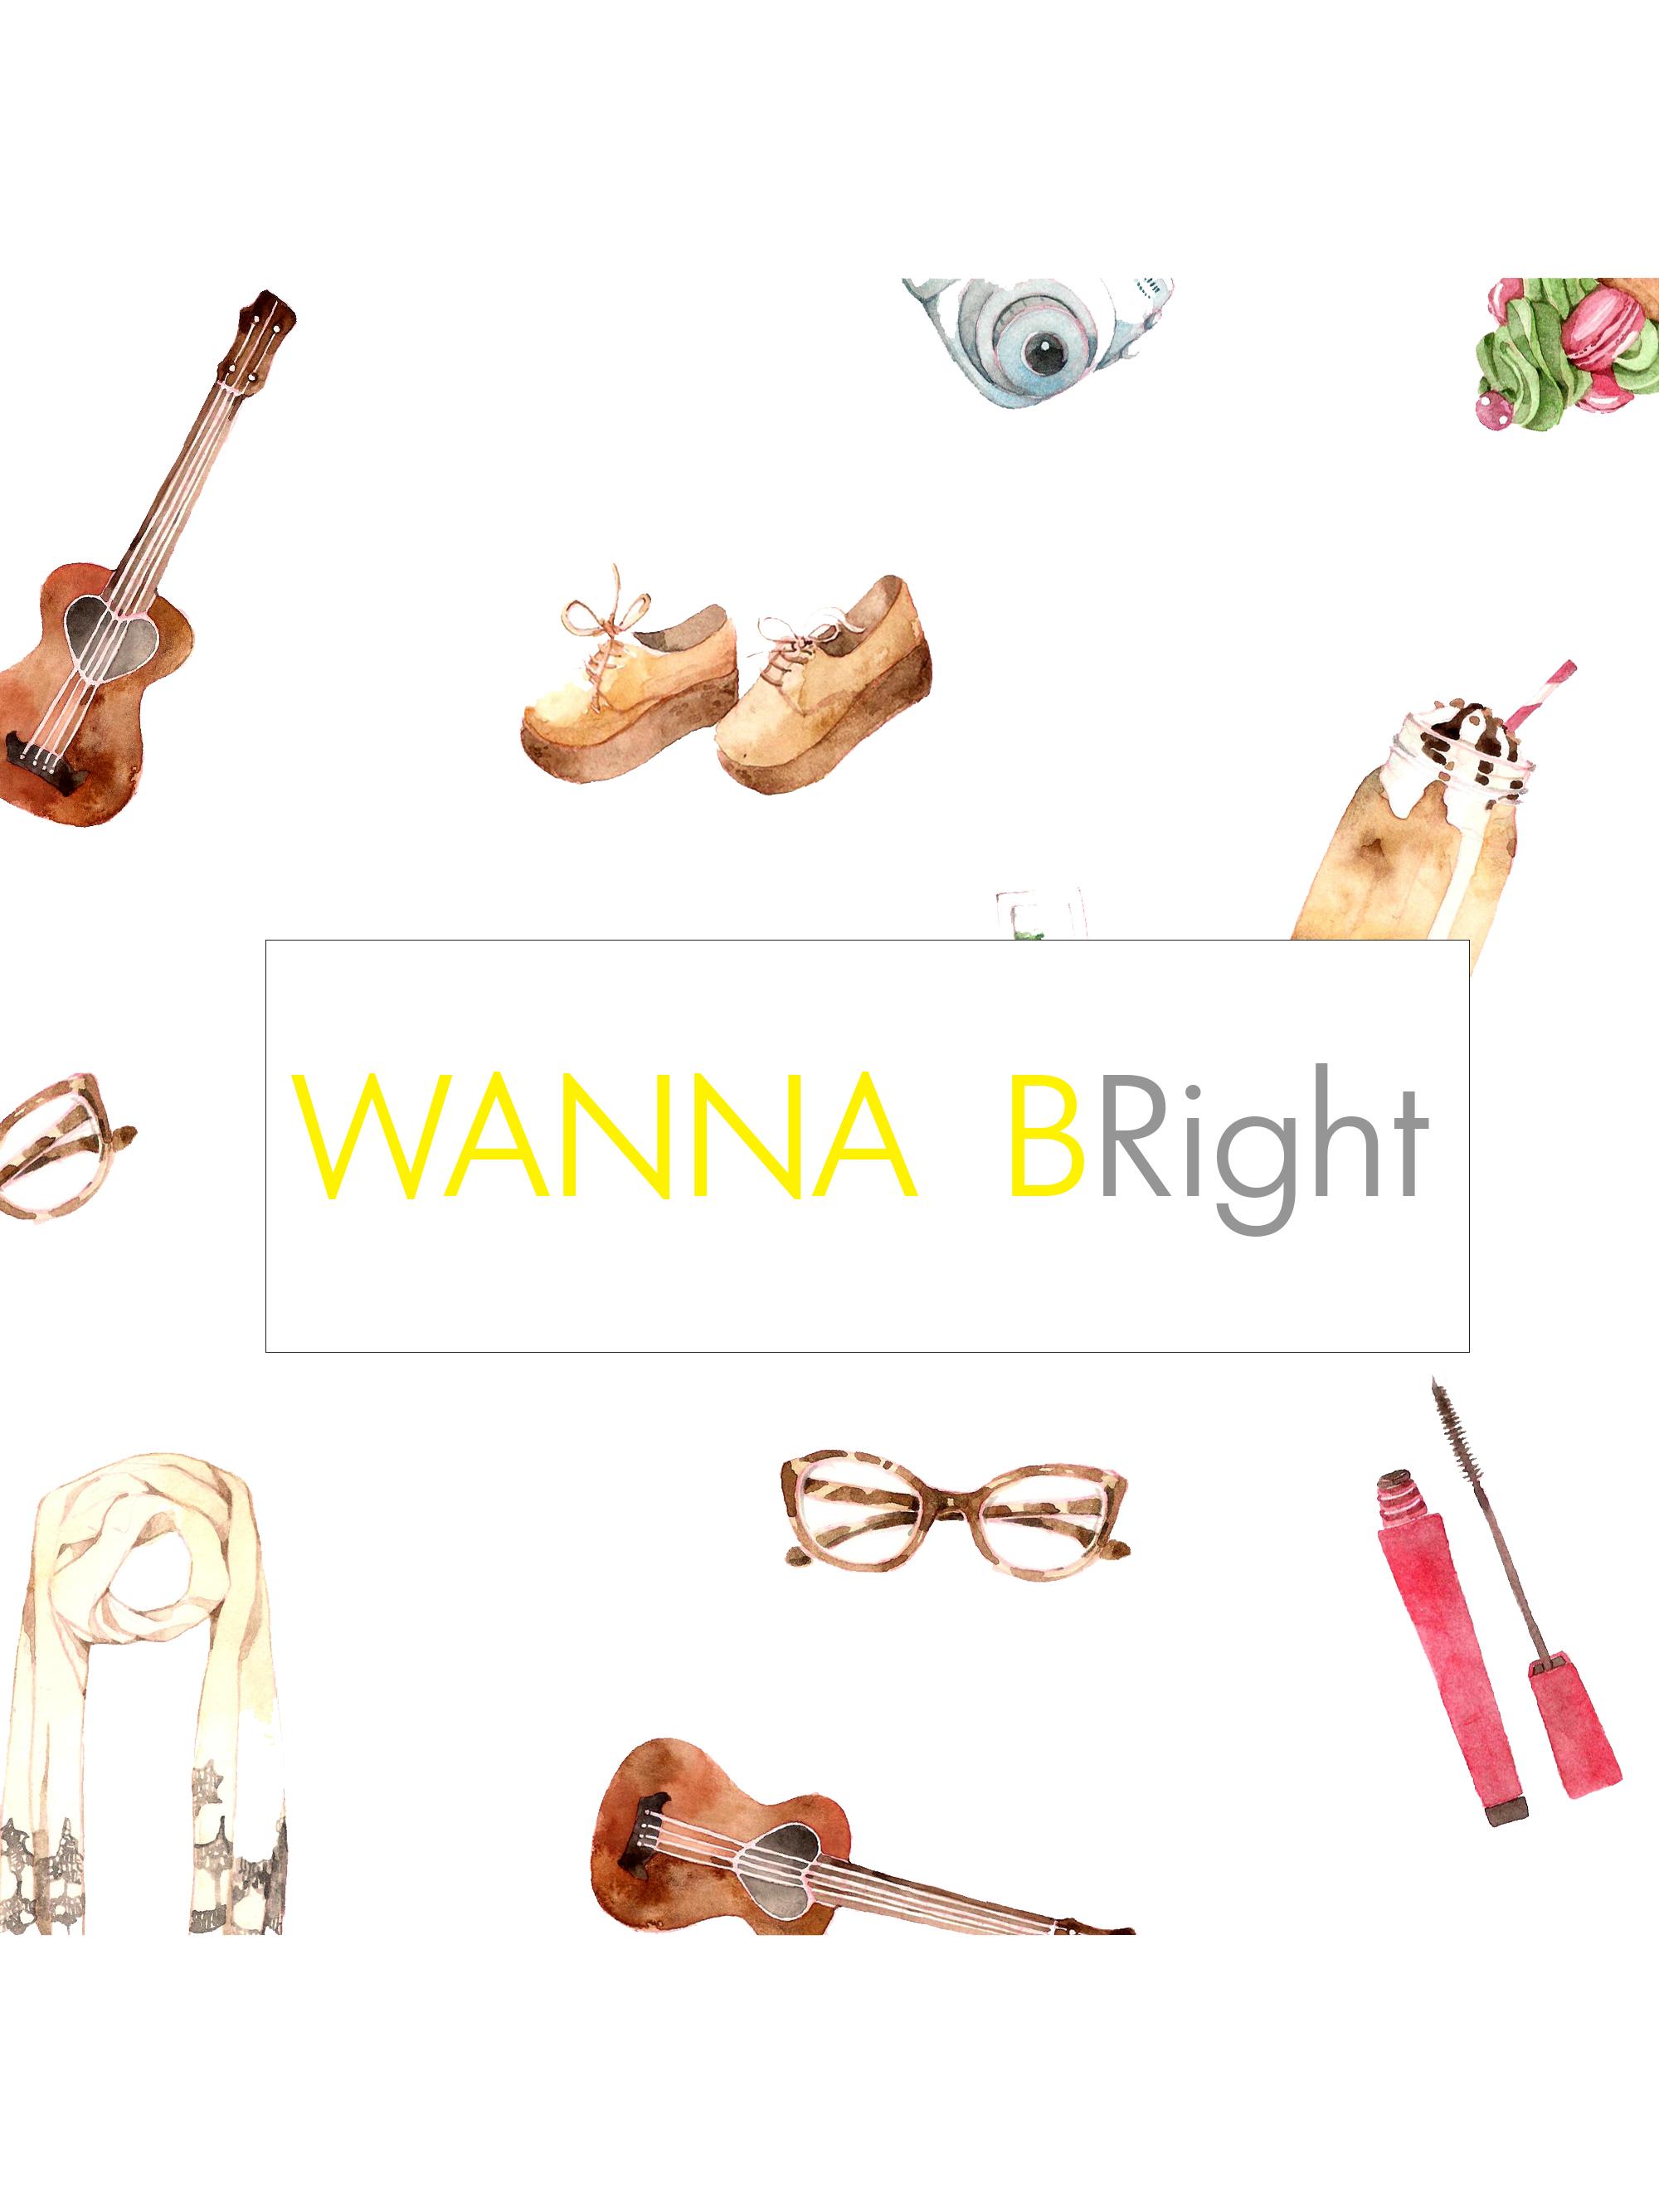 Wanna BRight